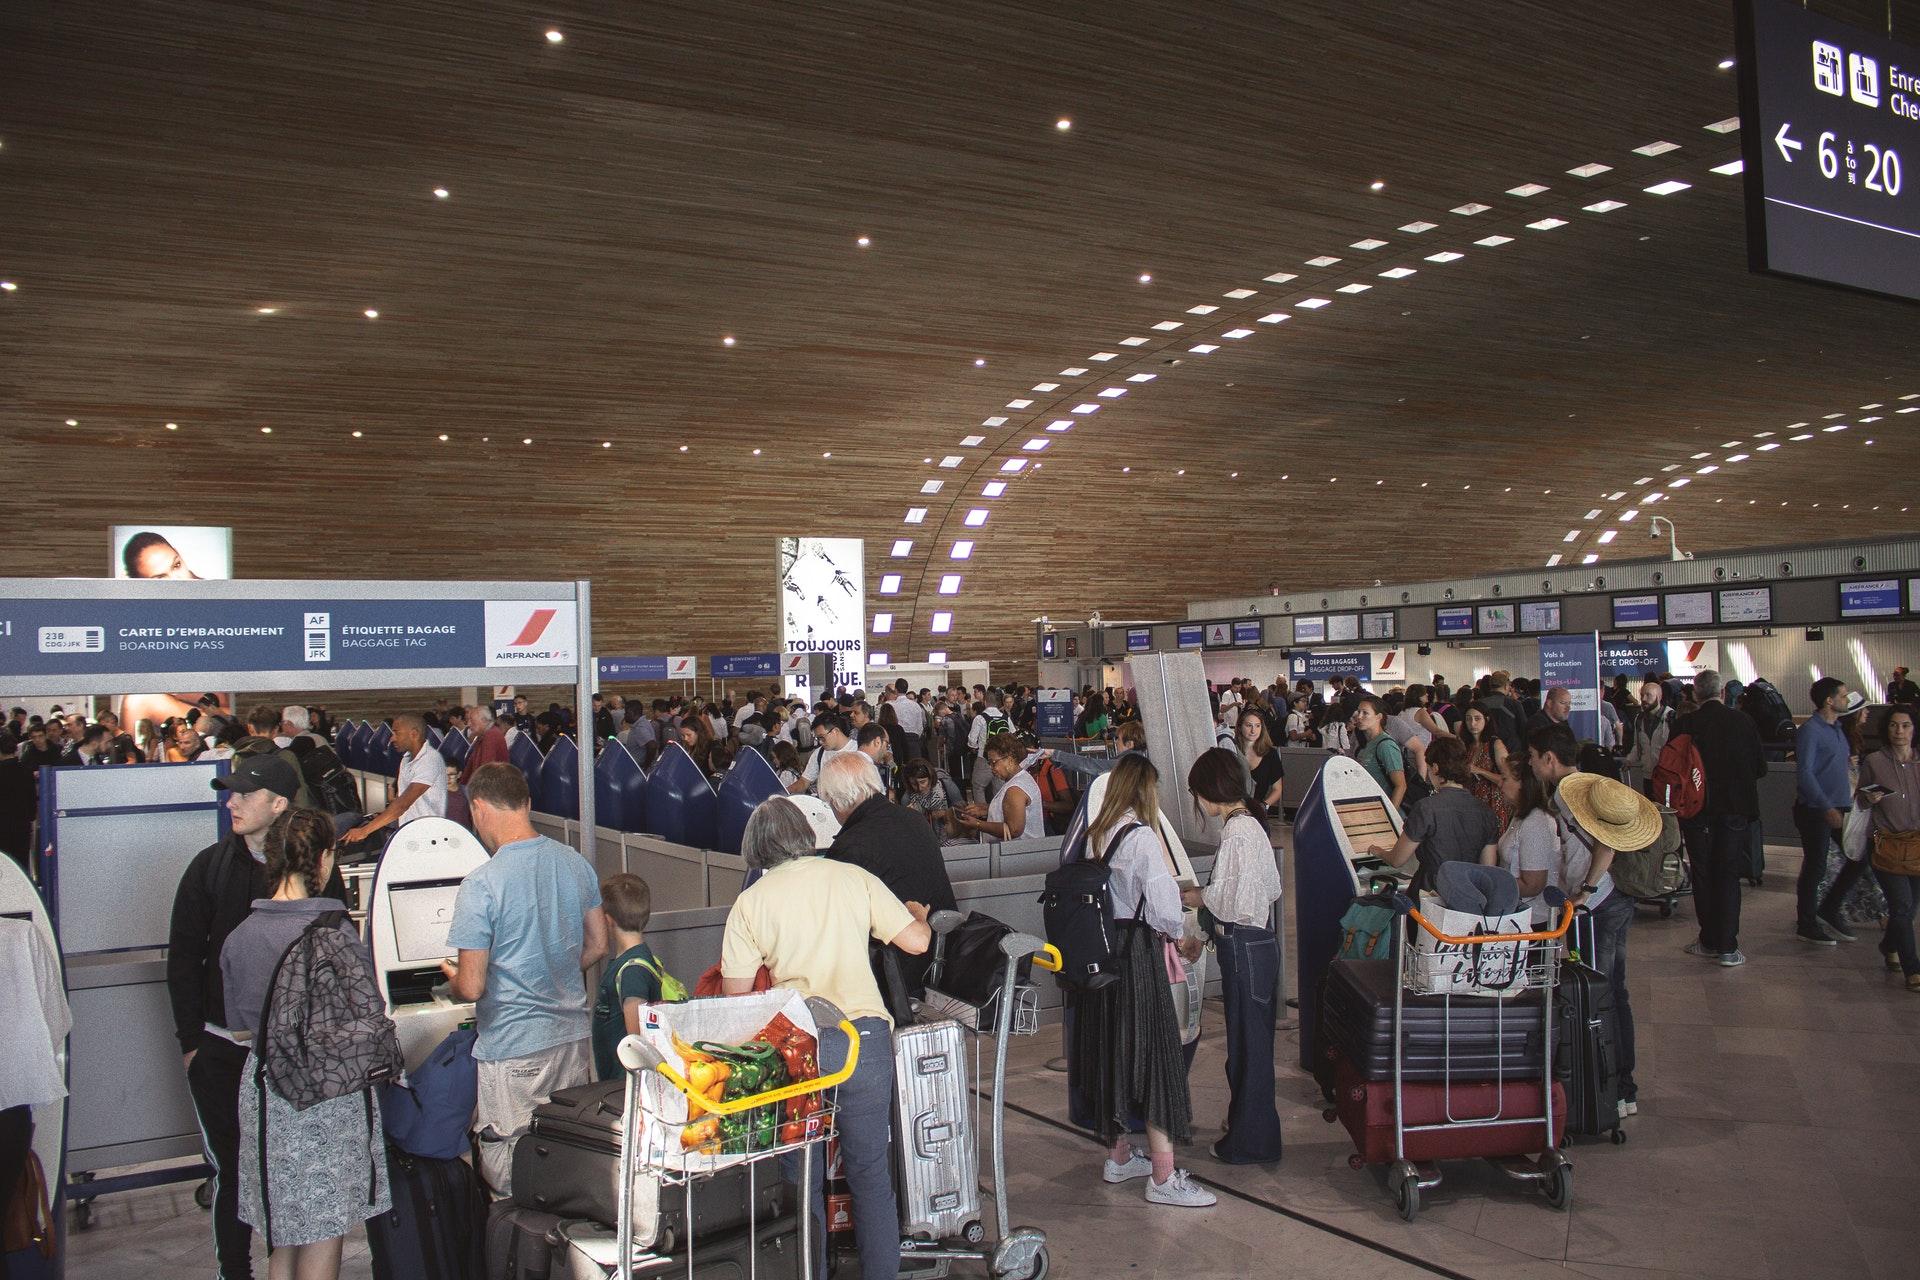 No shortcuts for TSA or Global Entry